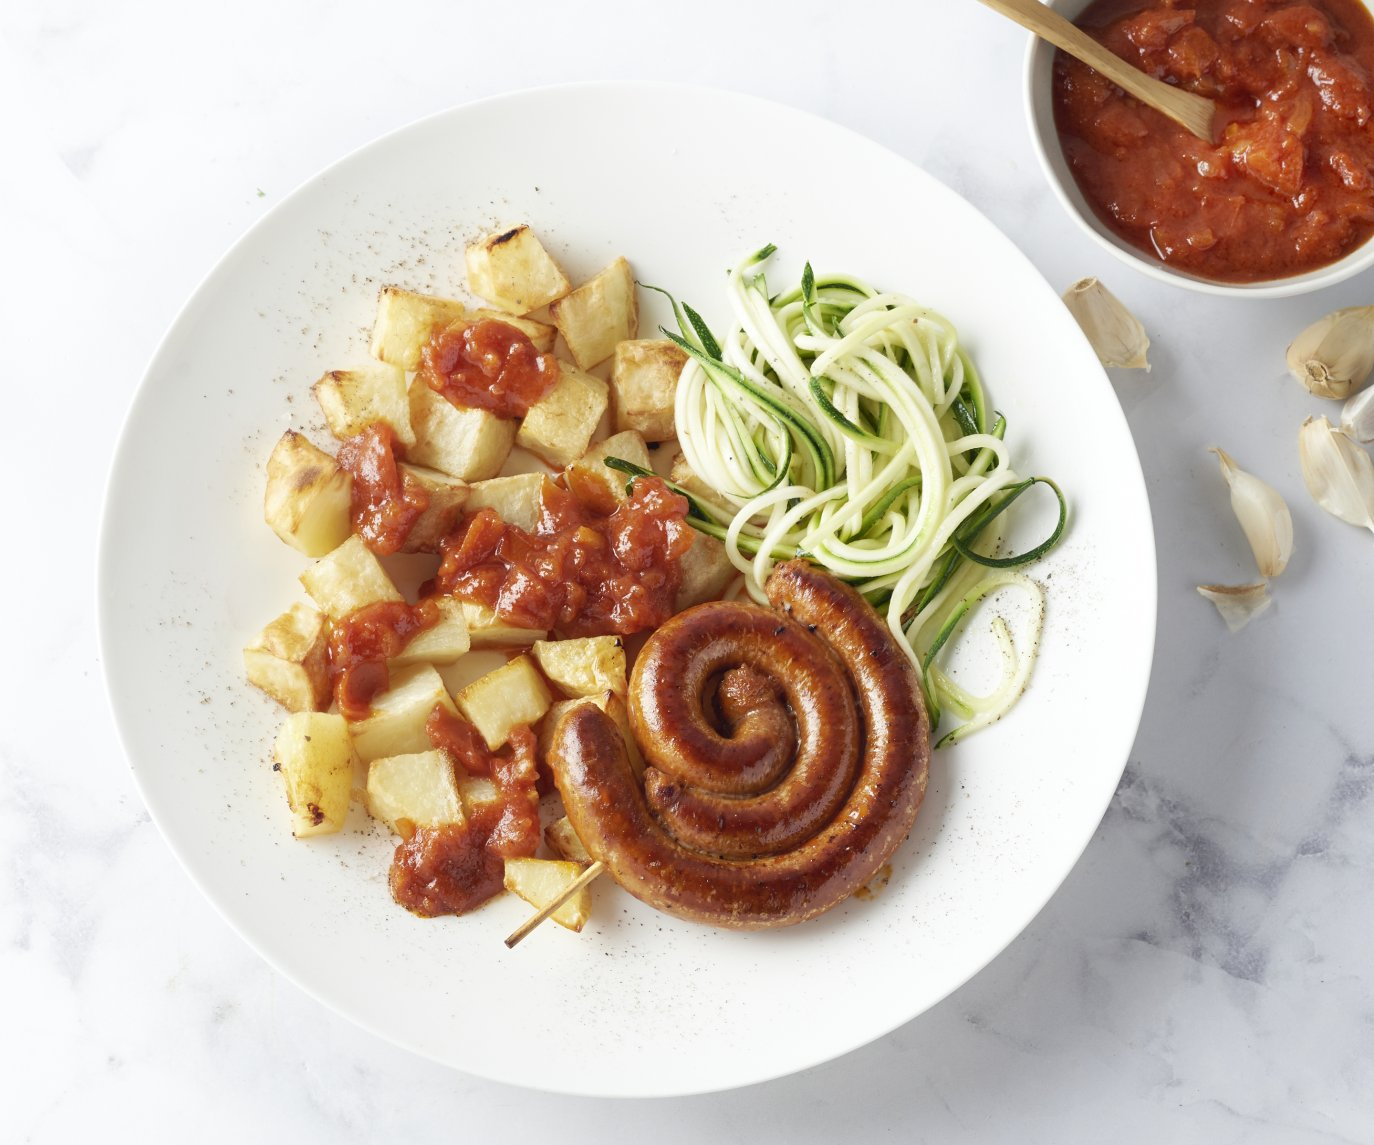 Patatas bravas met merguez en courgettespaghetti